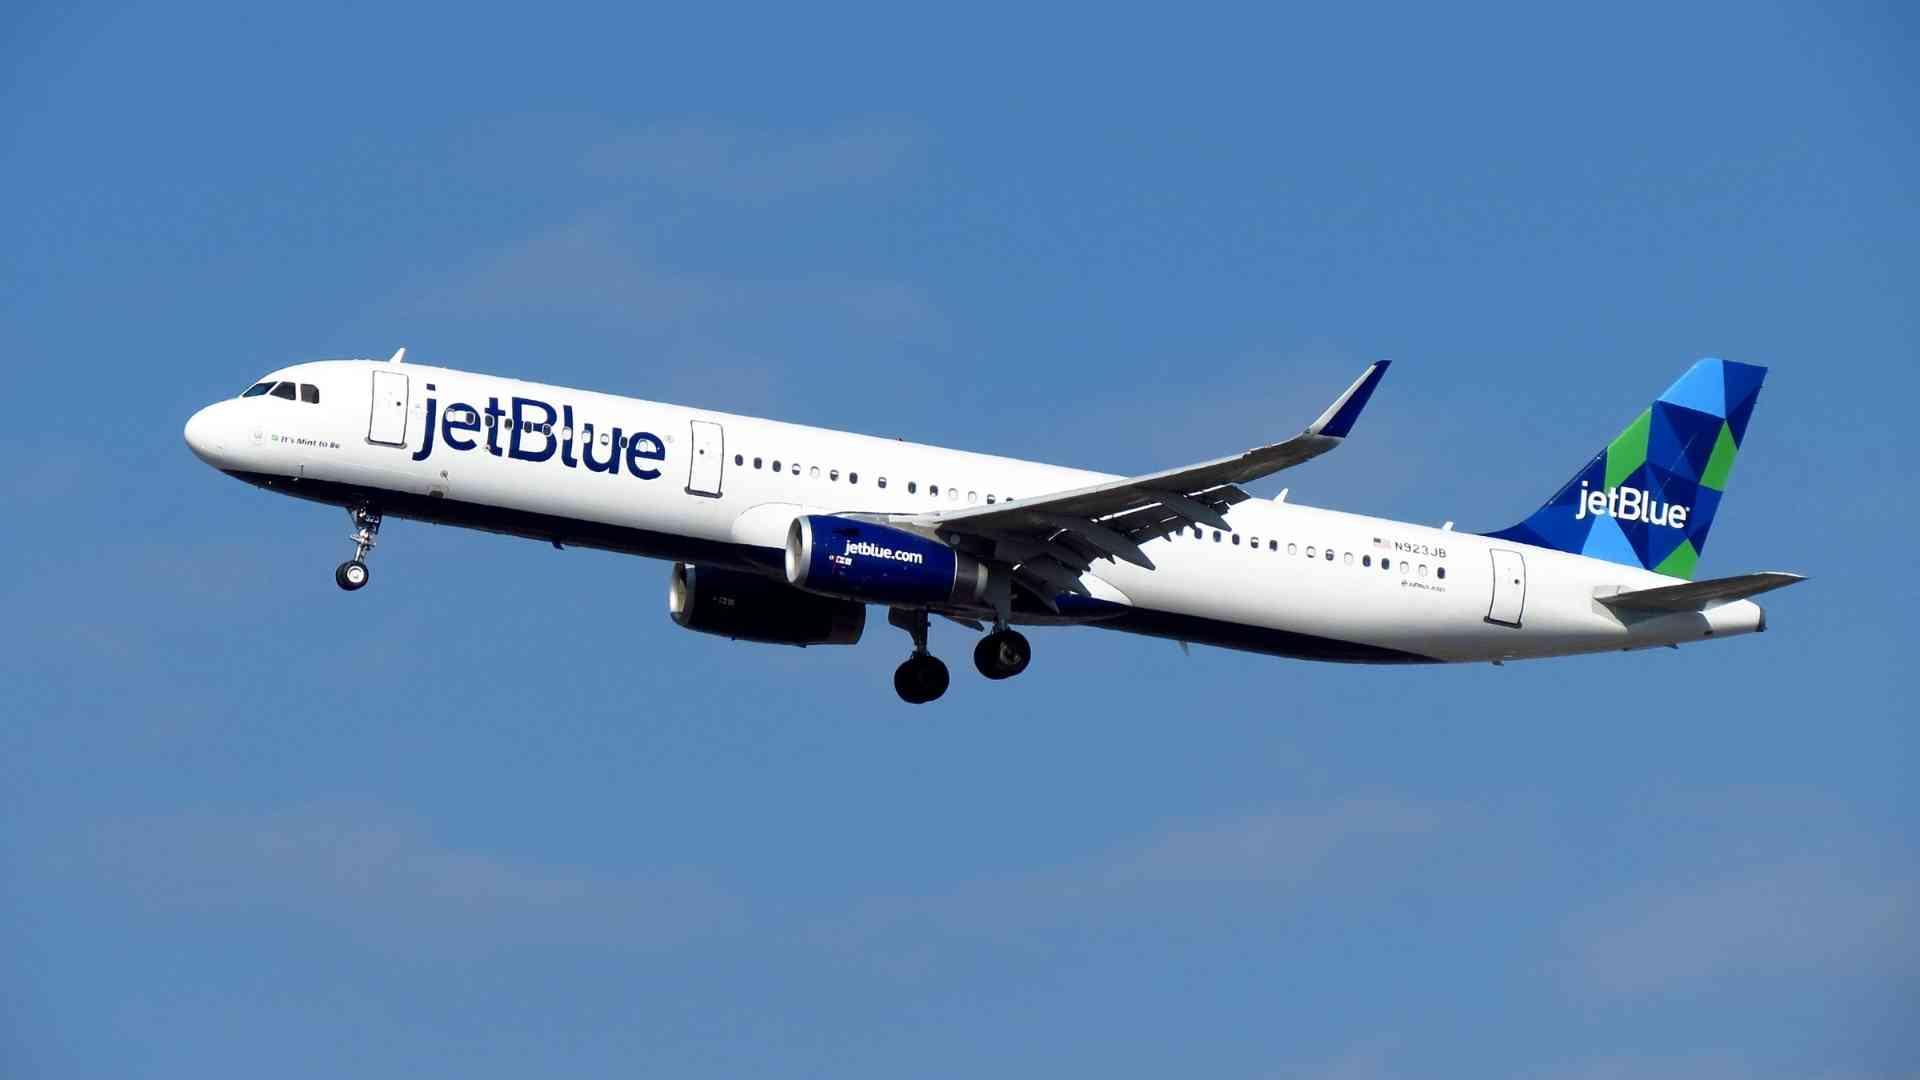 JetBlue Launches New York - London Service